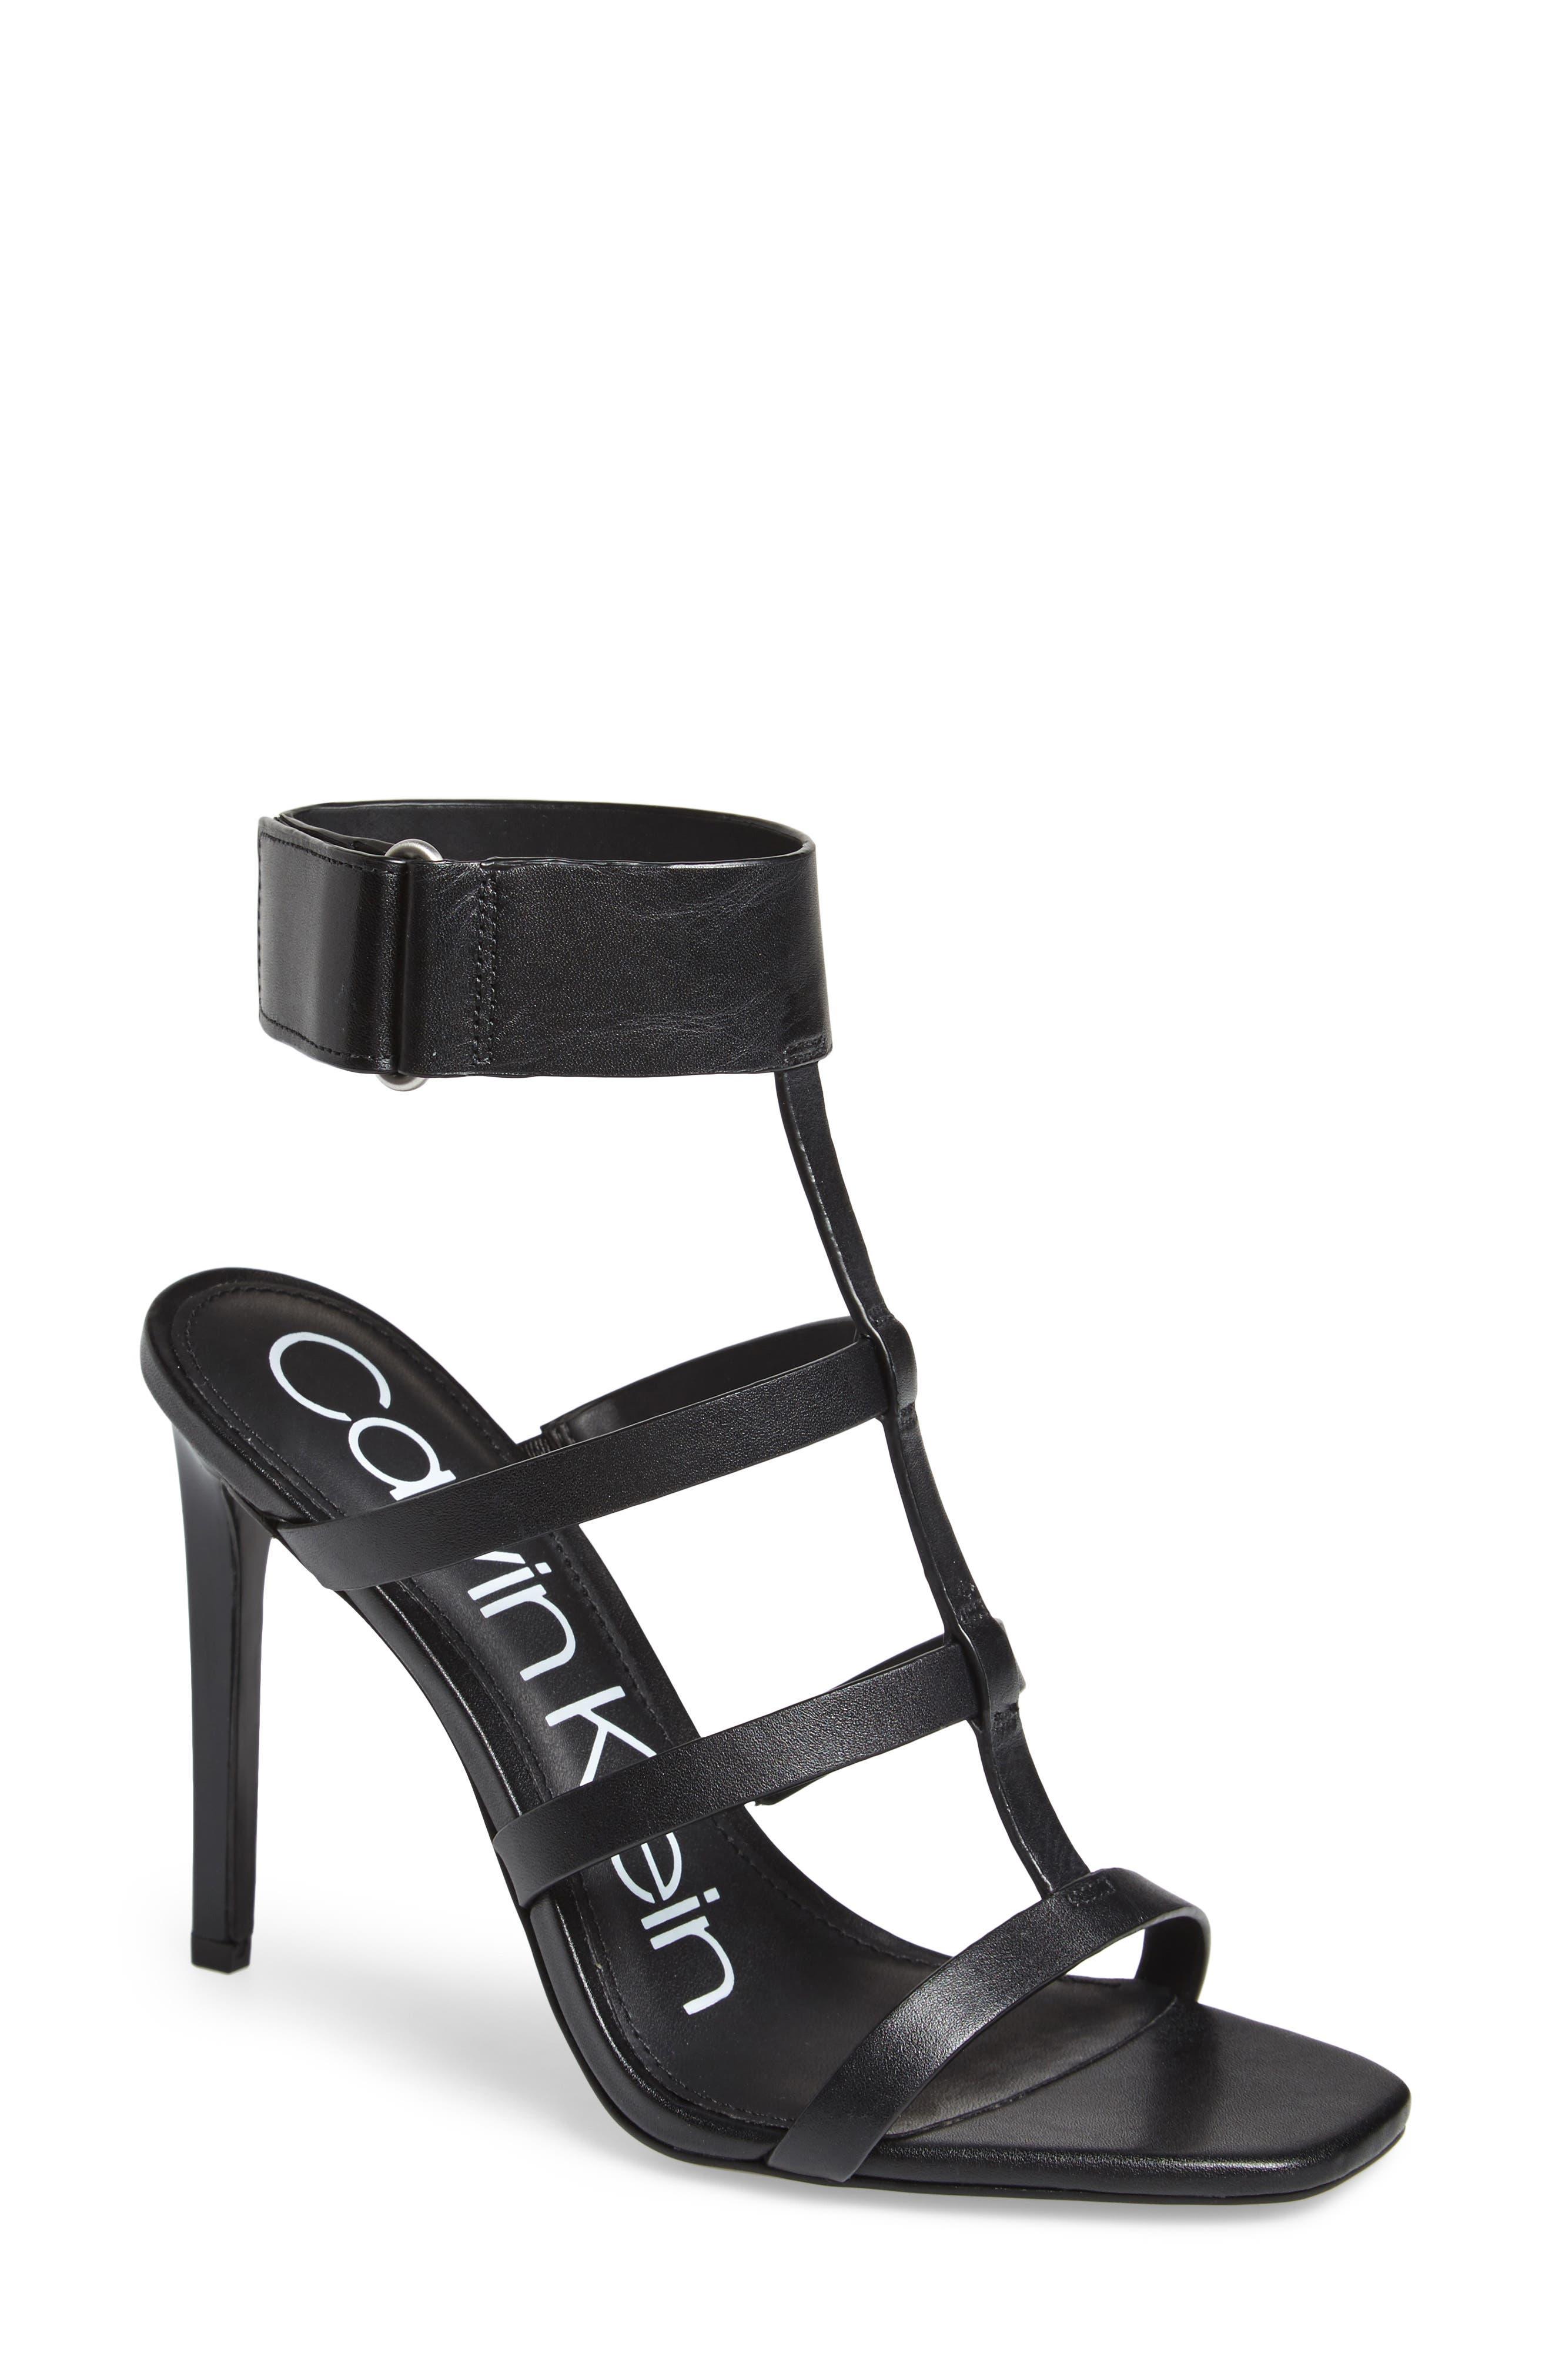 Alternate Image 1 Selected - Calvin Klein Dolcita Strappy Sandal (Women)